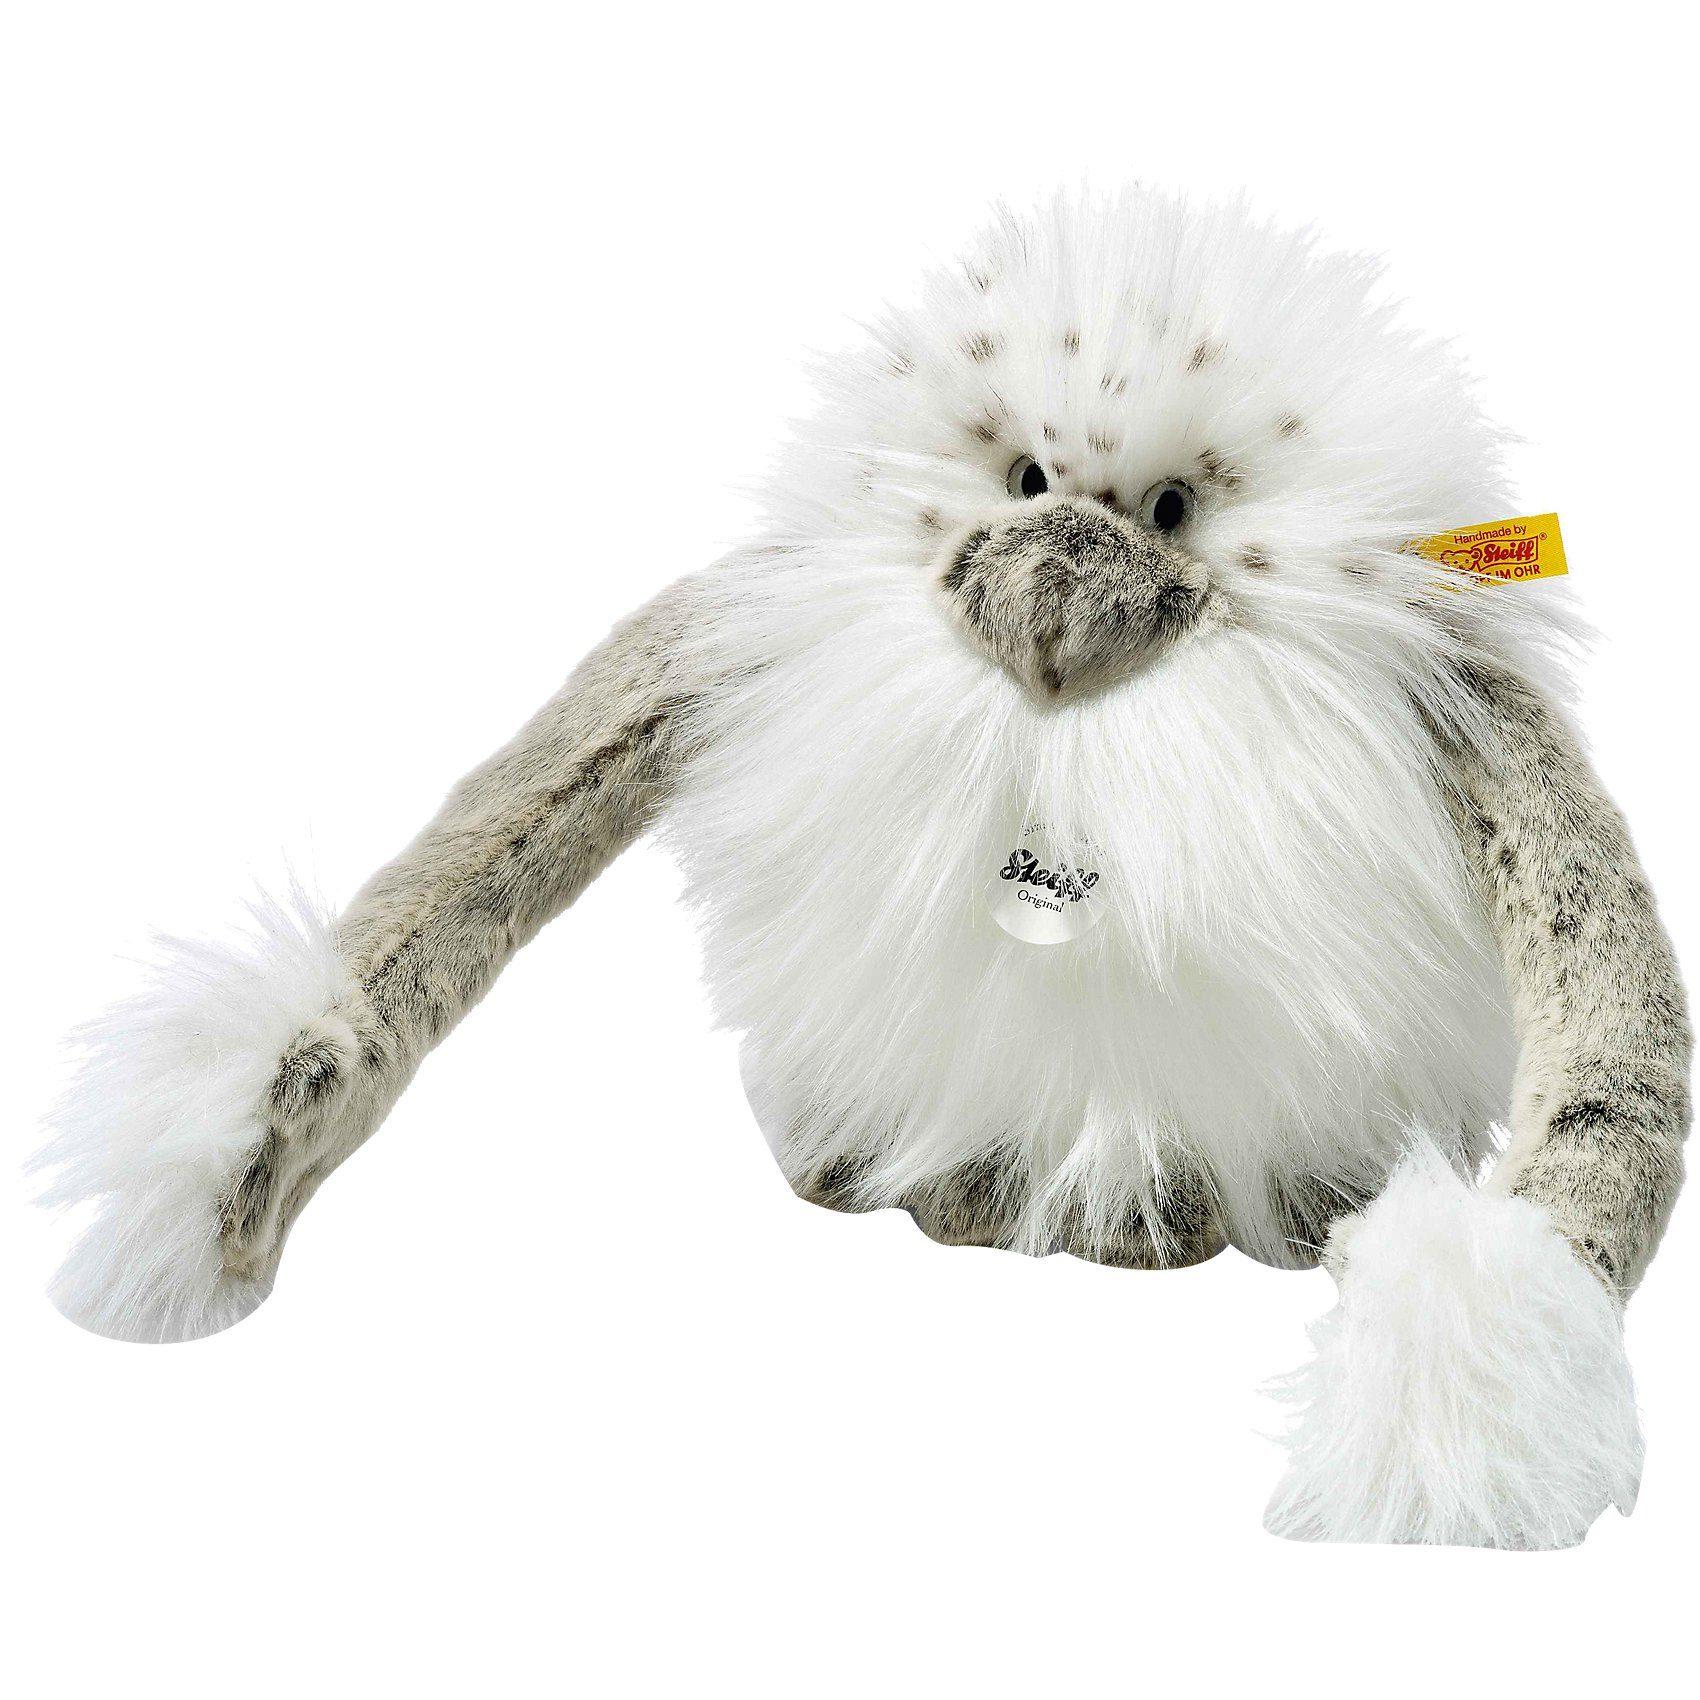 Steiff Nrommi Yeti 20 cm, weiss/grau stehend